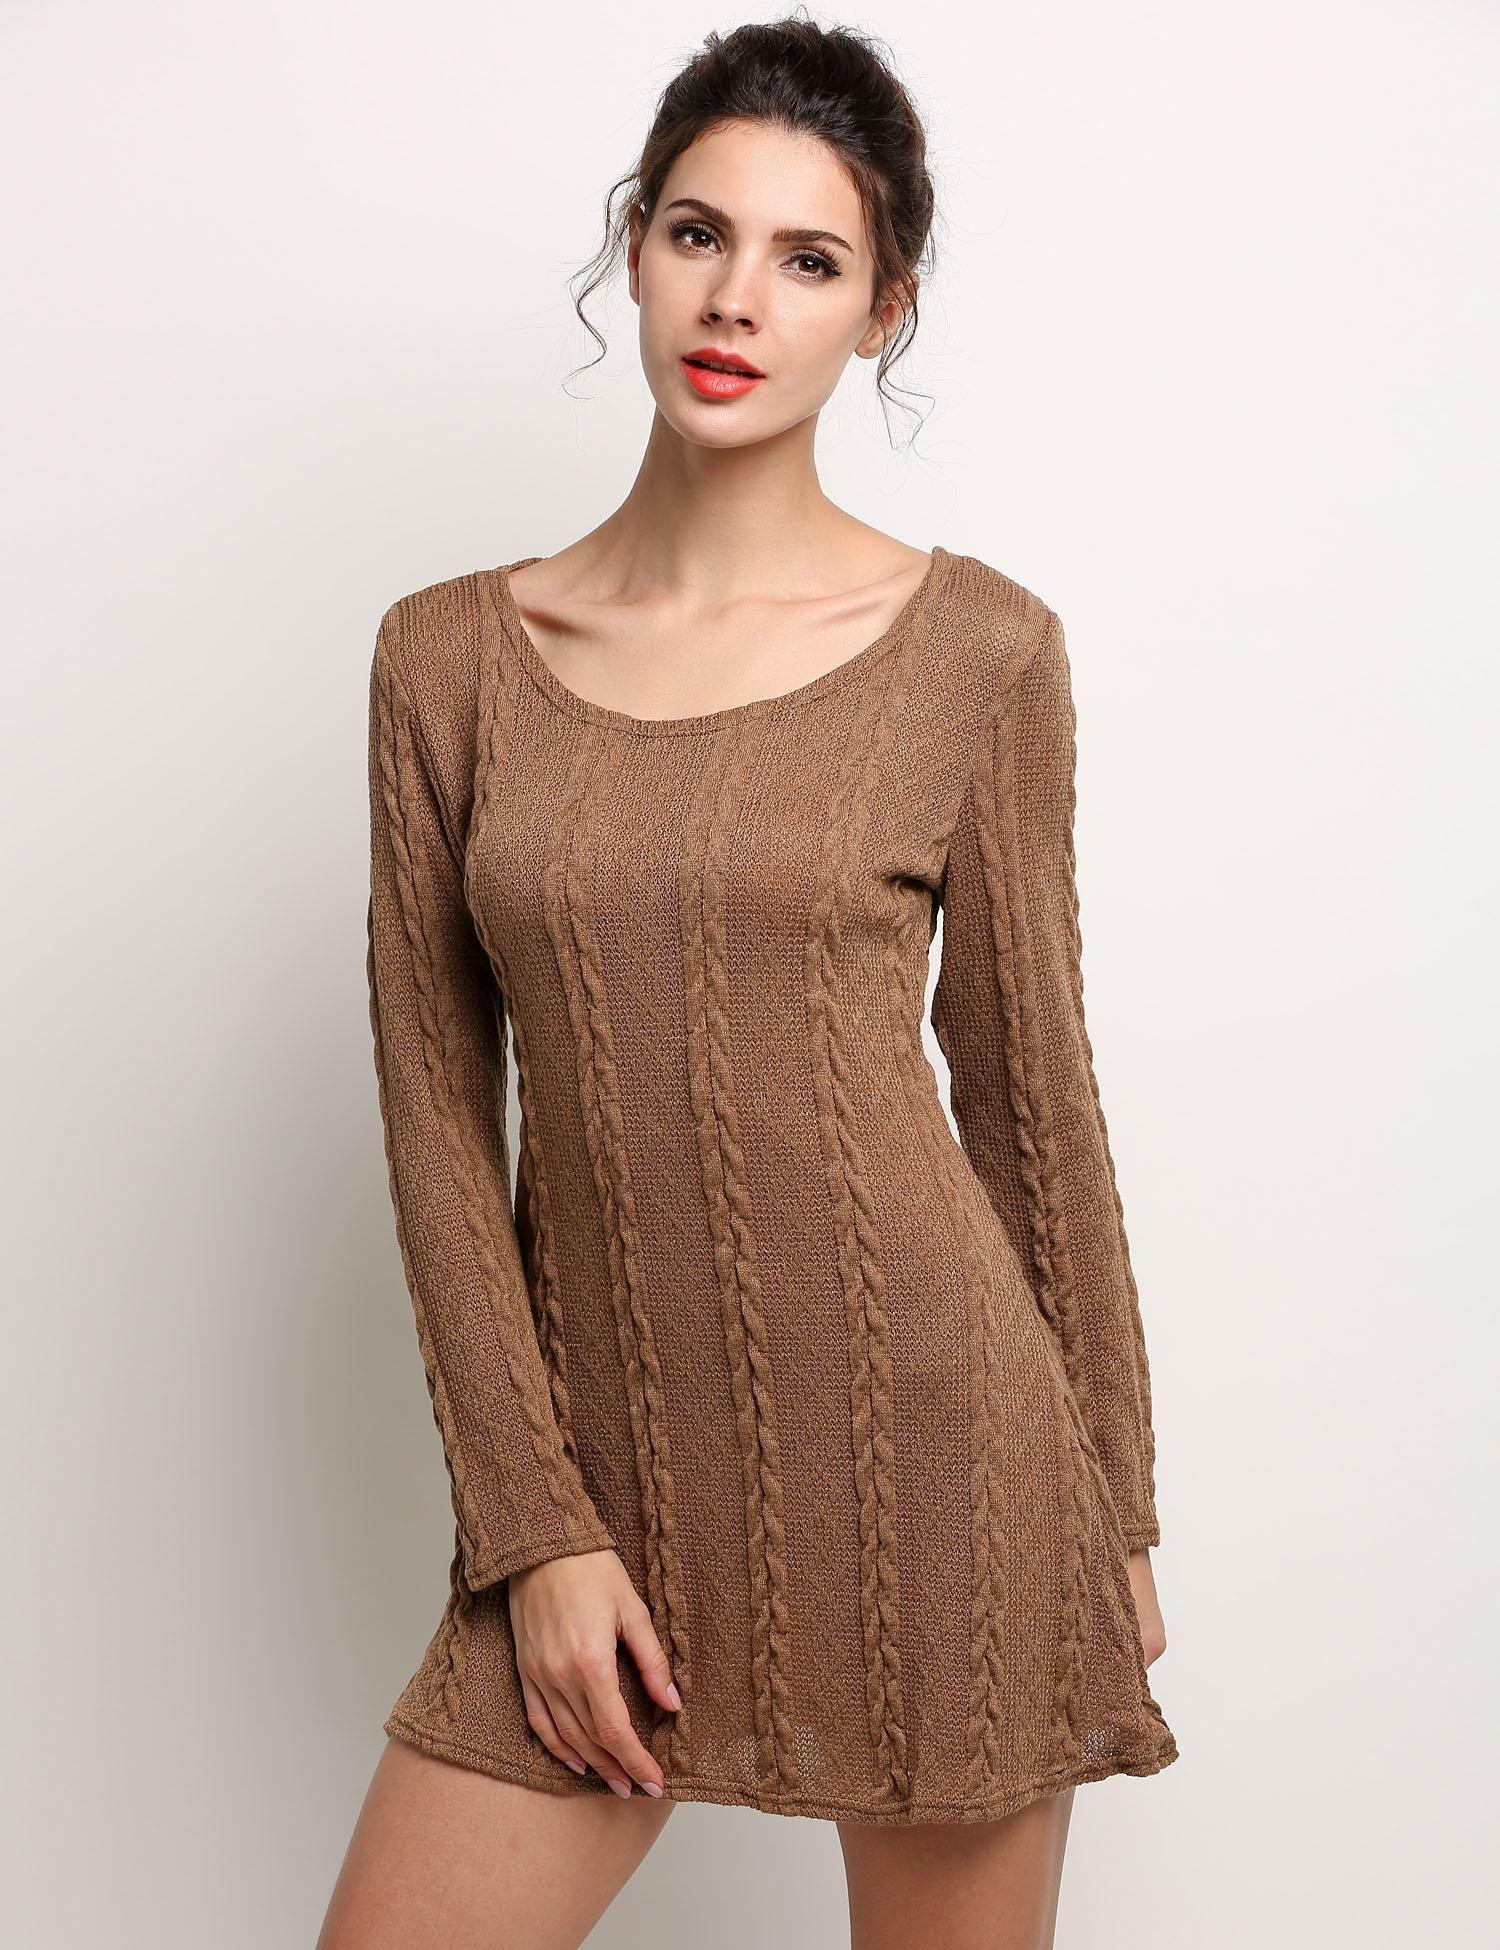 Marrón Mujeres Sweet Casual O-cuello de manga larga que hace punto Mini  vestido sólido dresslink.com a0803aa4d98f